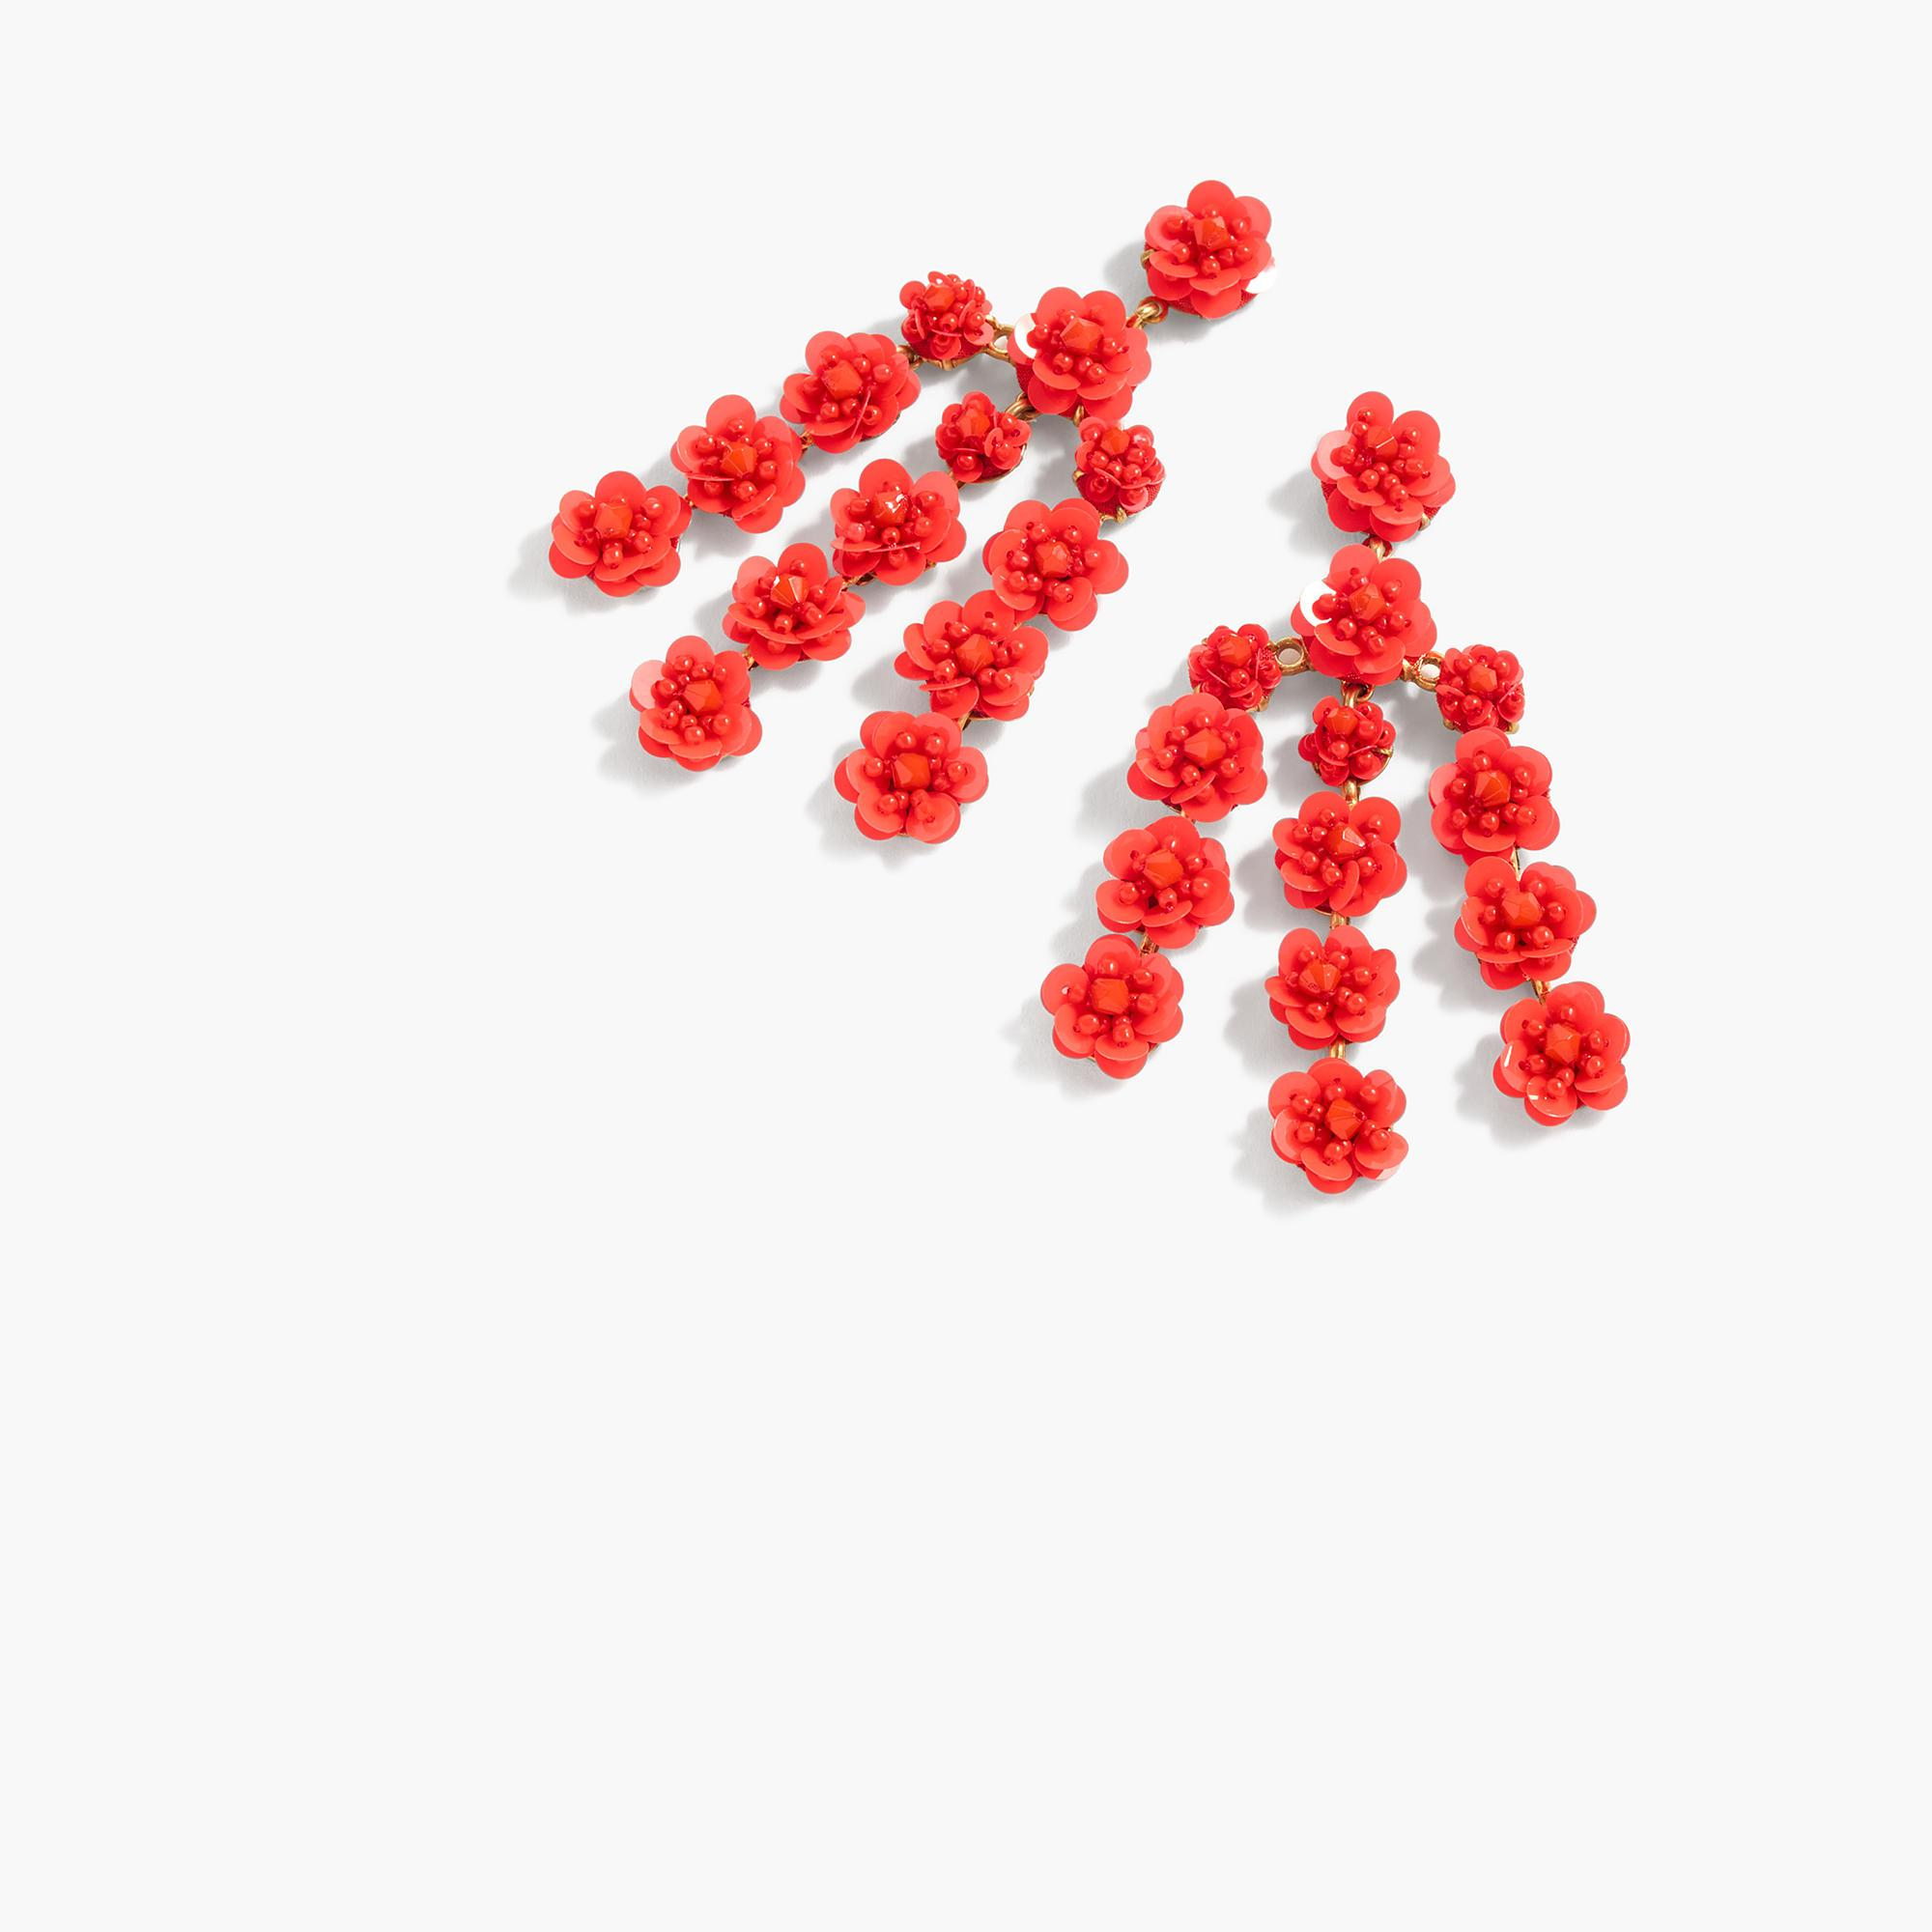 5c121fc89ae J Crew Red Sequin Earrings - Best All Earring Photos Kamilmaciol.Com